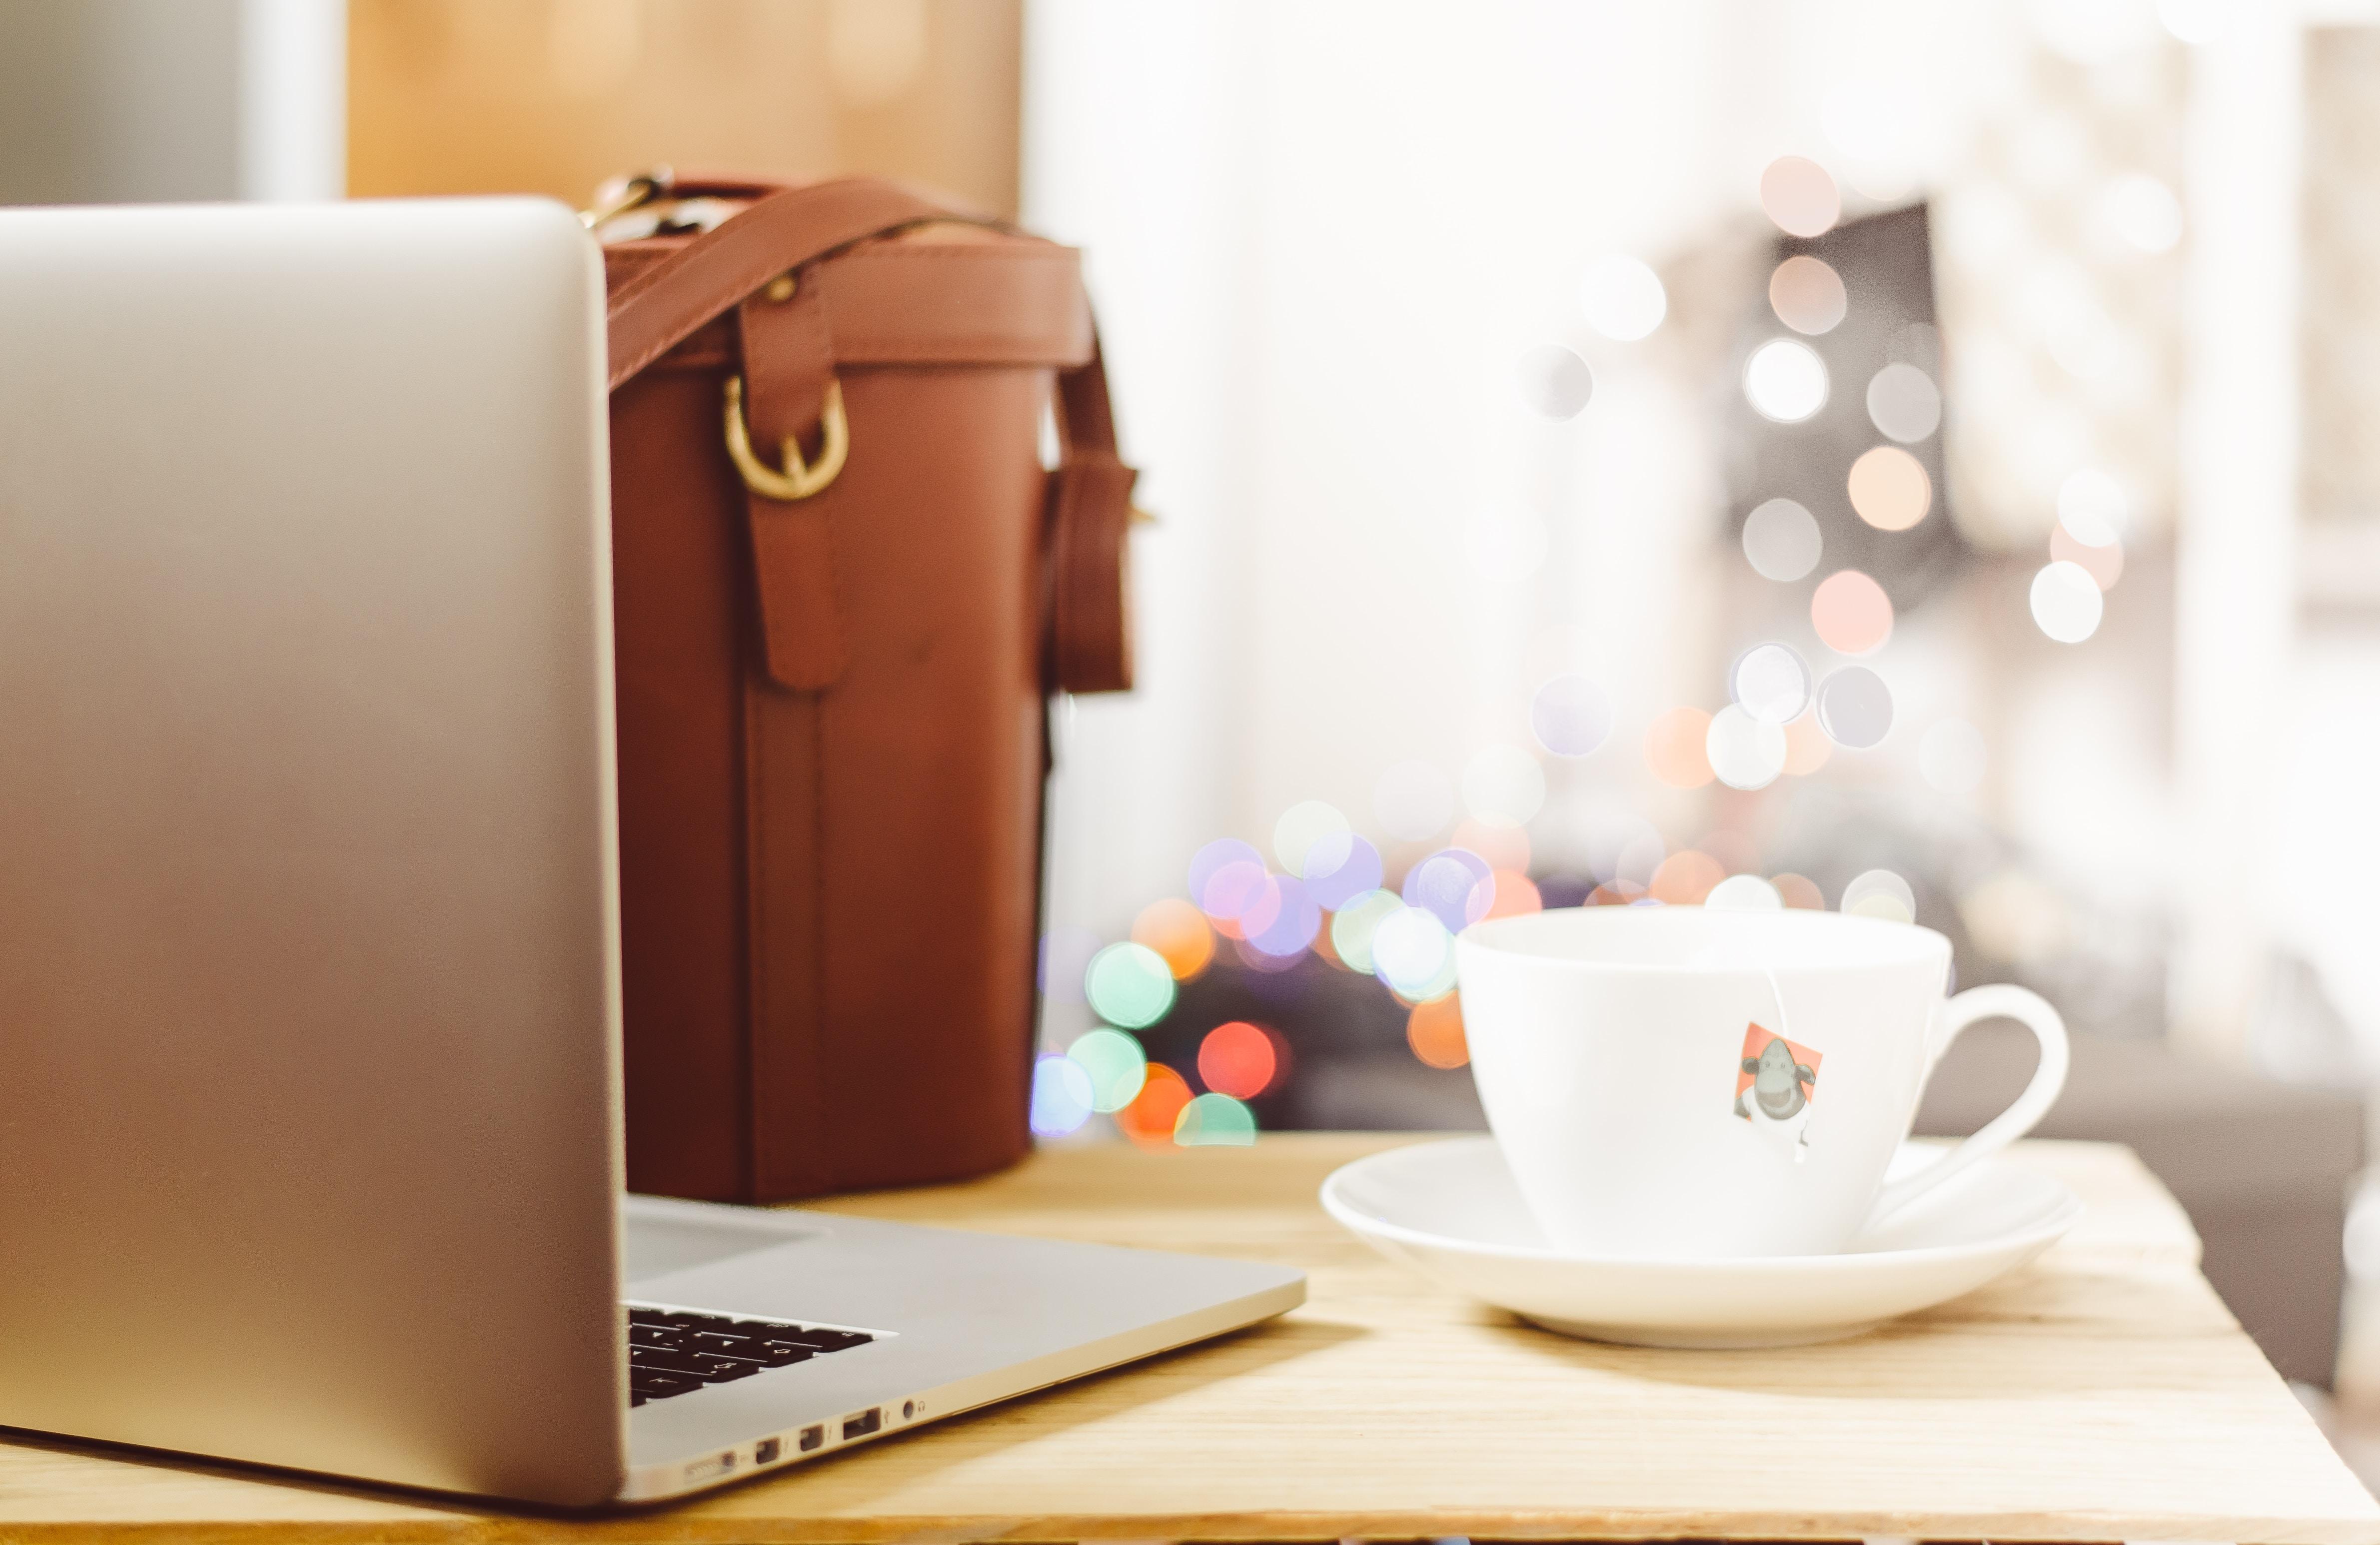 gray laptop beside teacup and bg